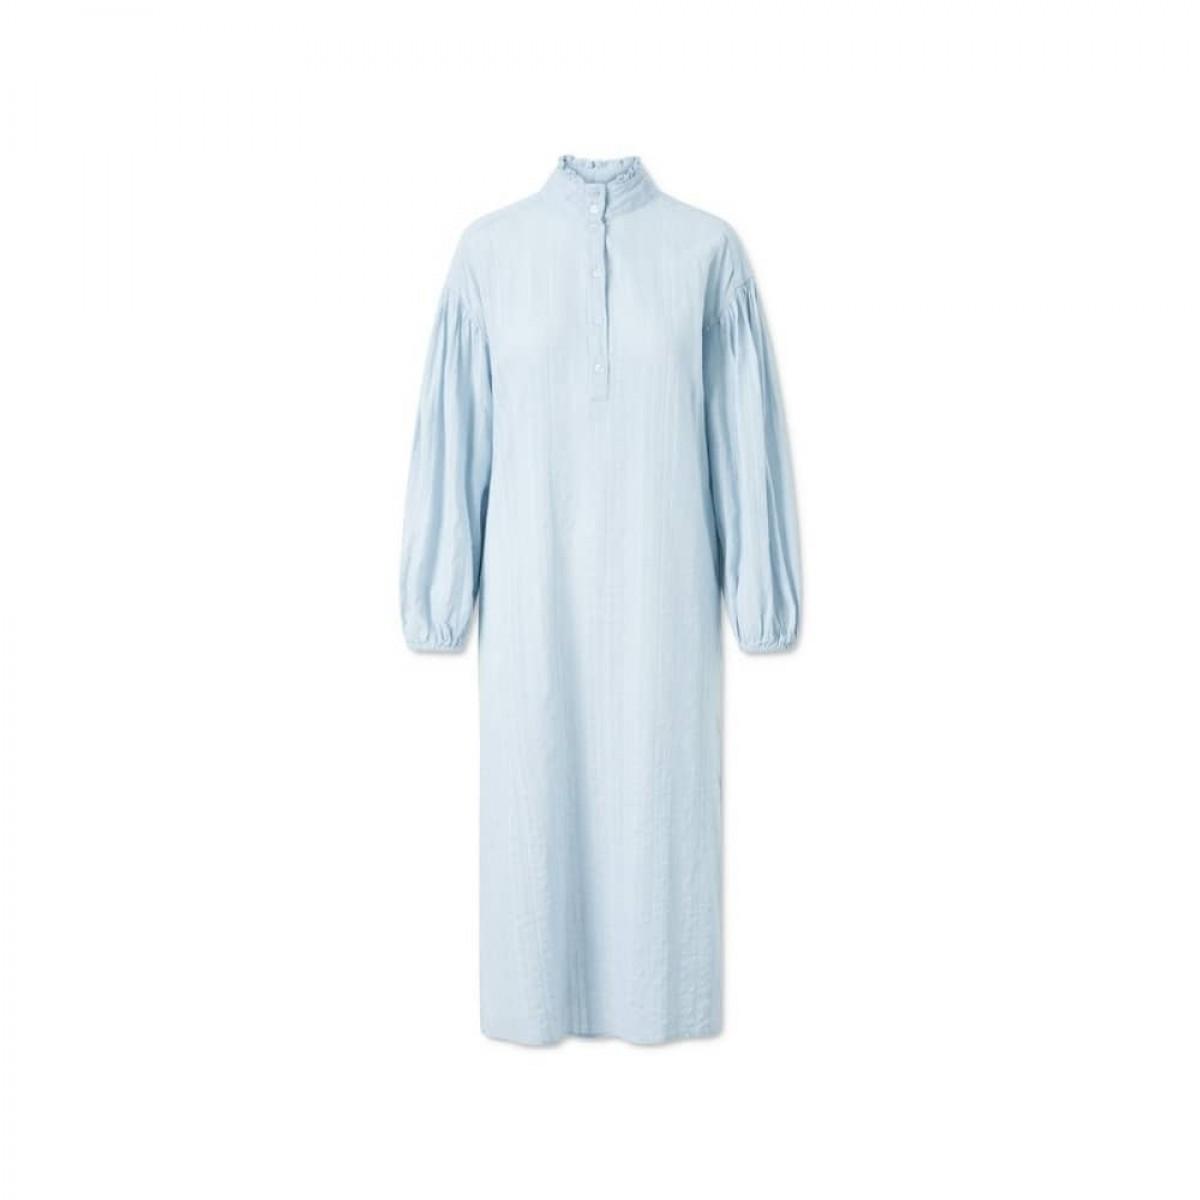 jordana dress - artic ice